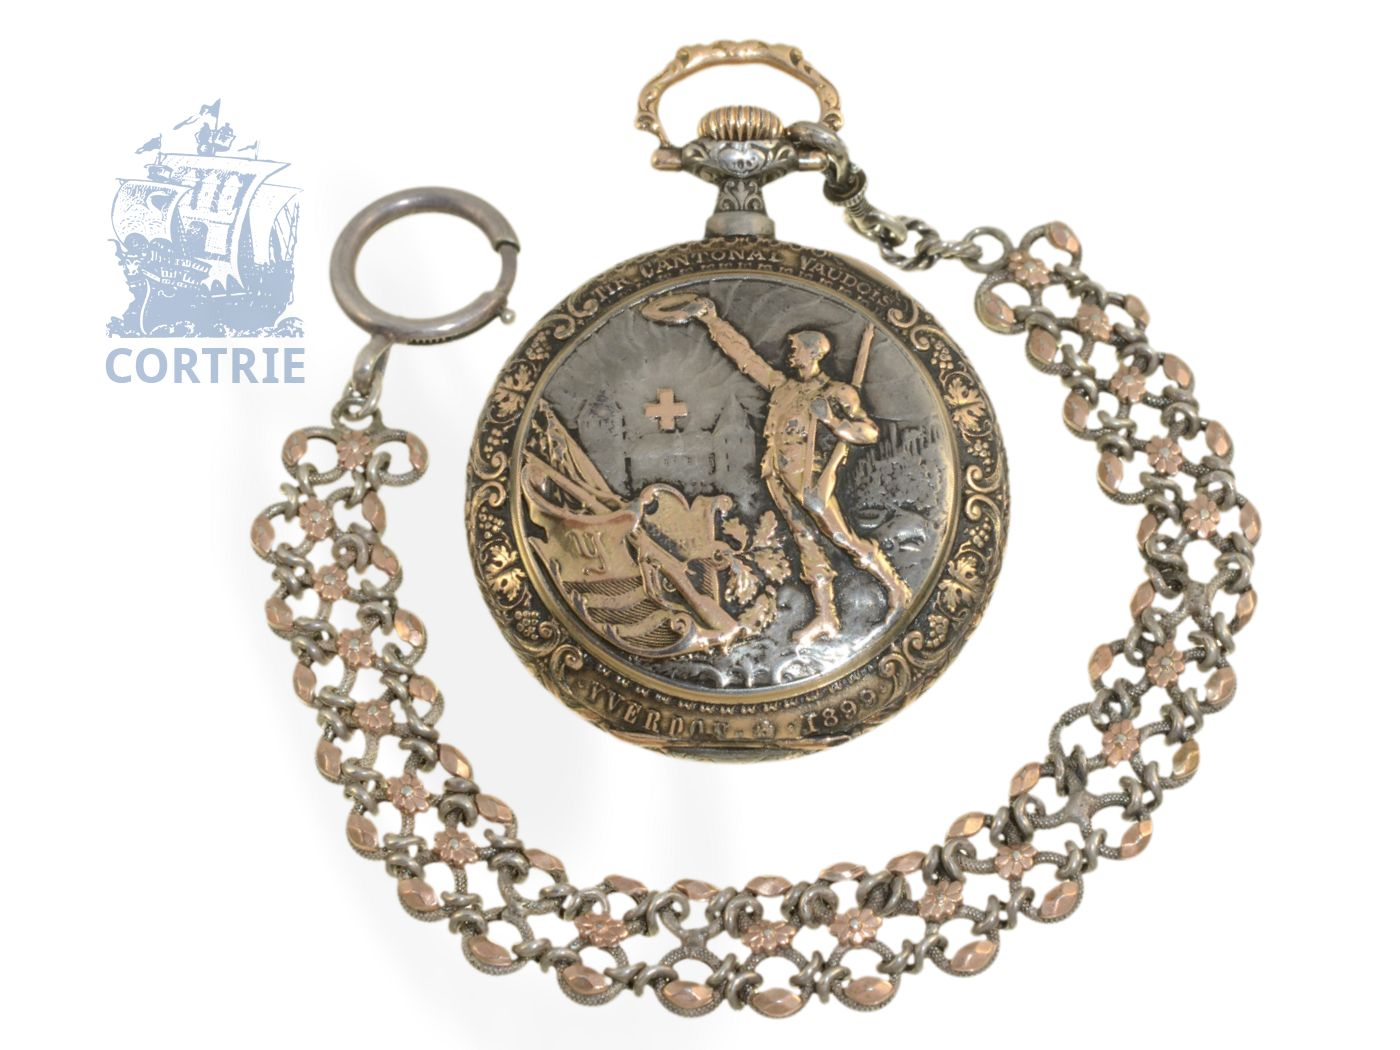 Pocket watch: rare Art Nouveau marksmen watch Tir Cantonal Vaudois Yverdon1899, Ankerchronometer Piguet-Capt Brassus-